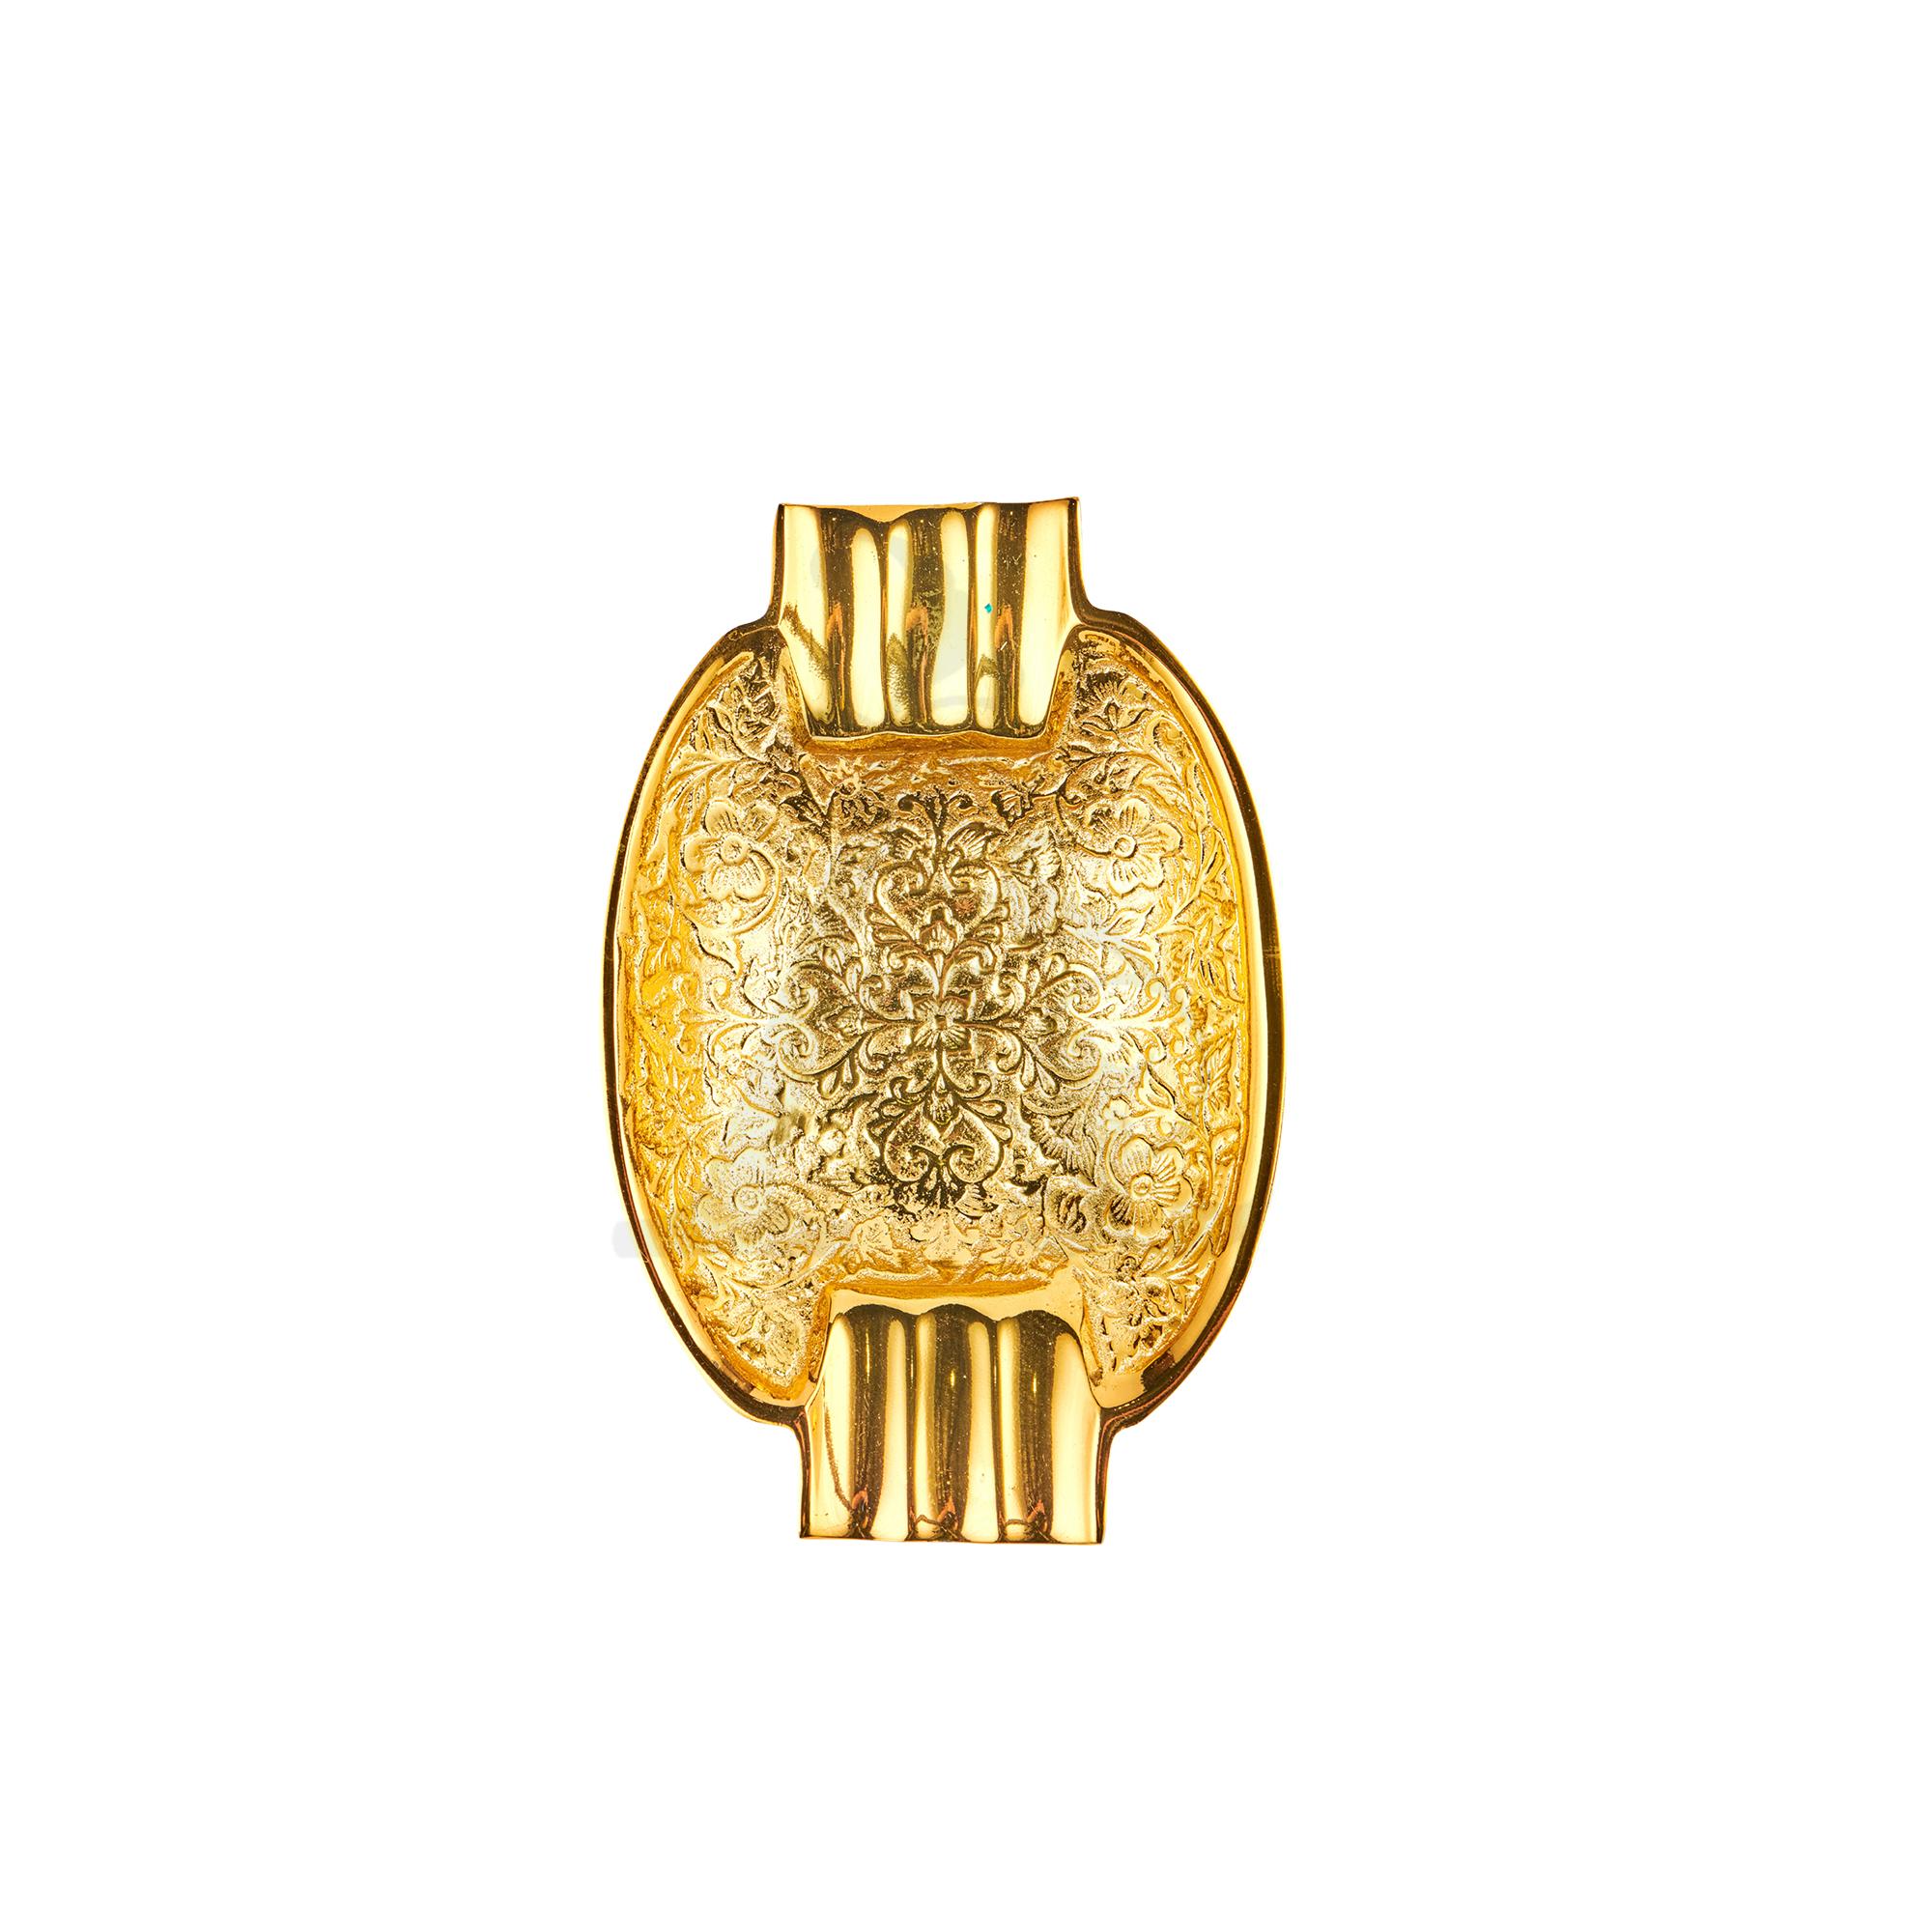 Buy Gold Ashtray